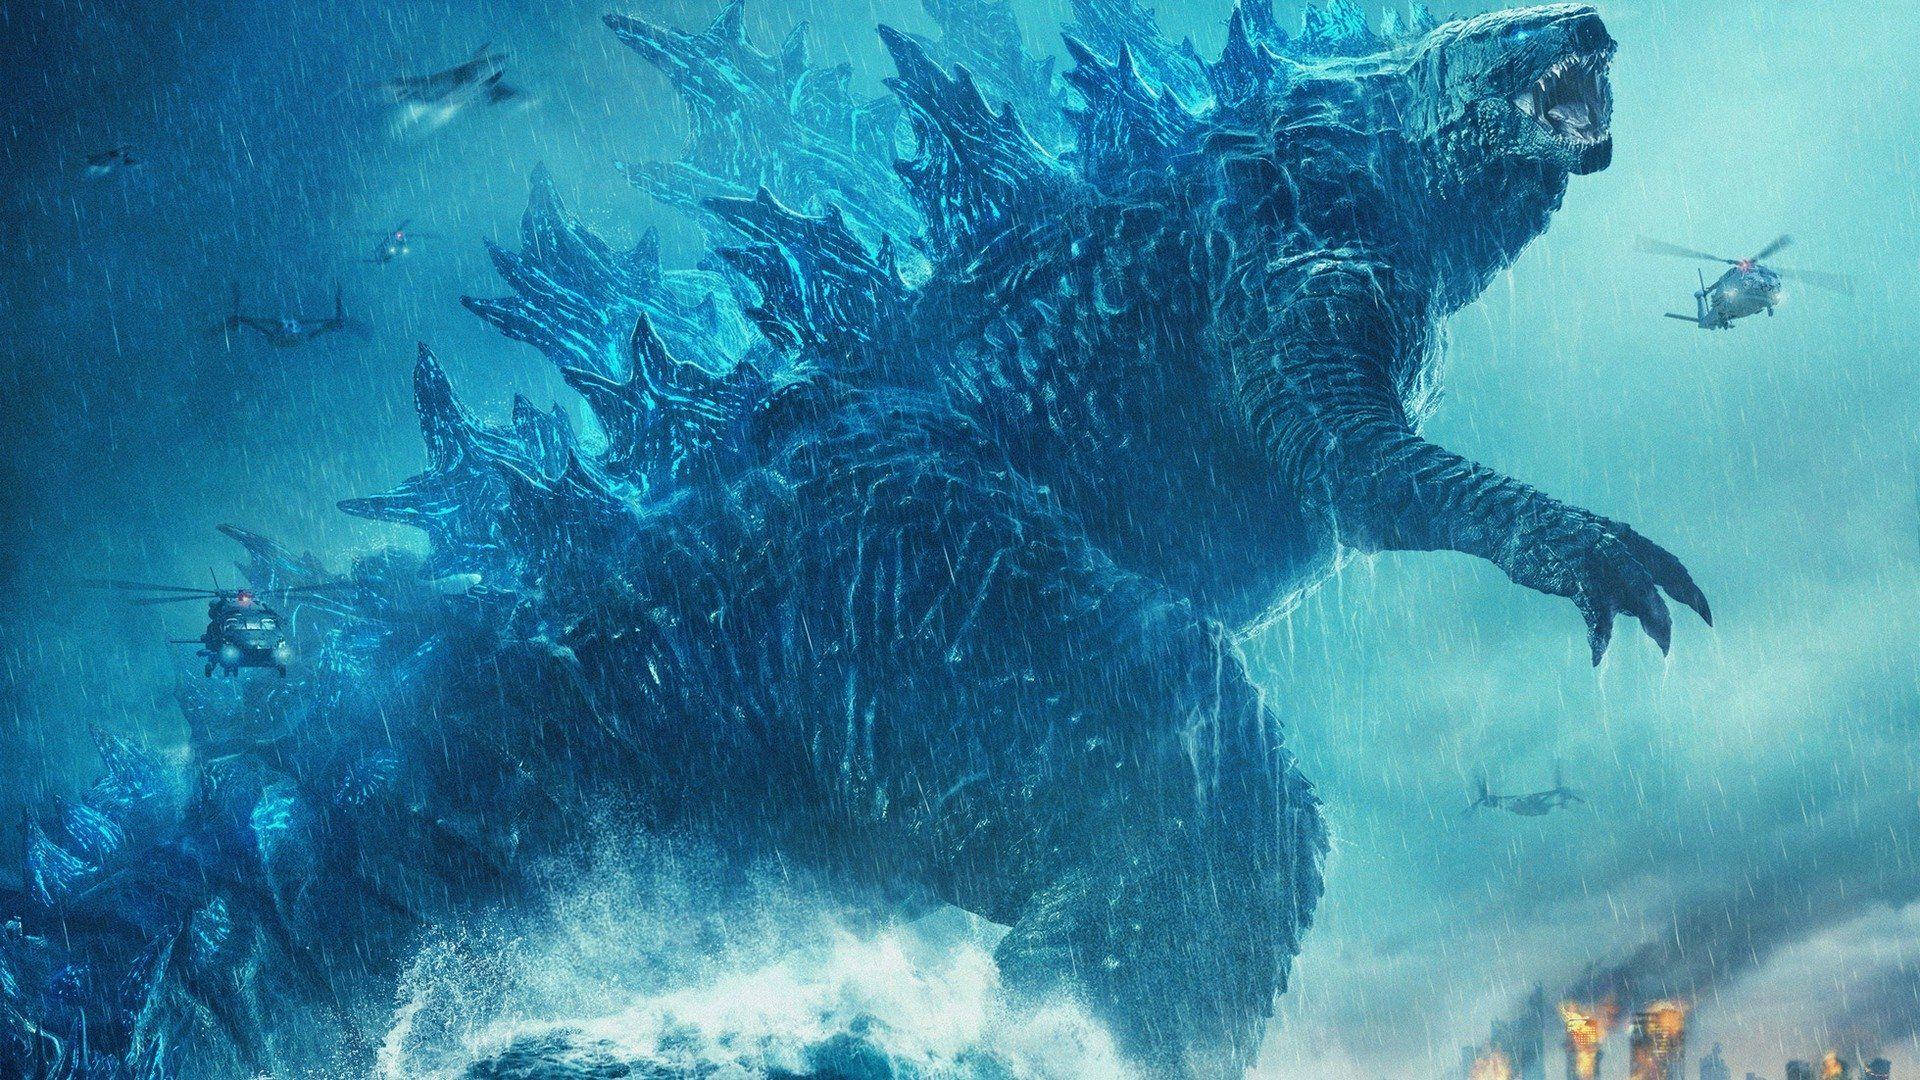 Godzilla King Of The Monsters Wallpapers   Top Godzilla 1920x1080